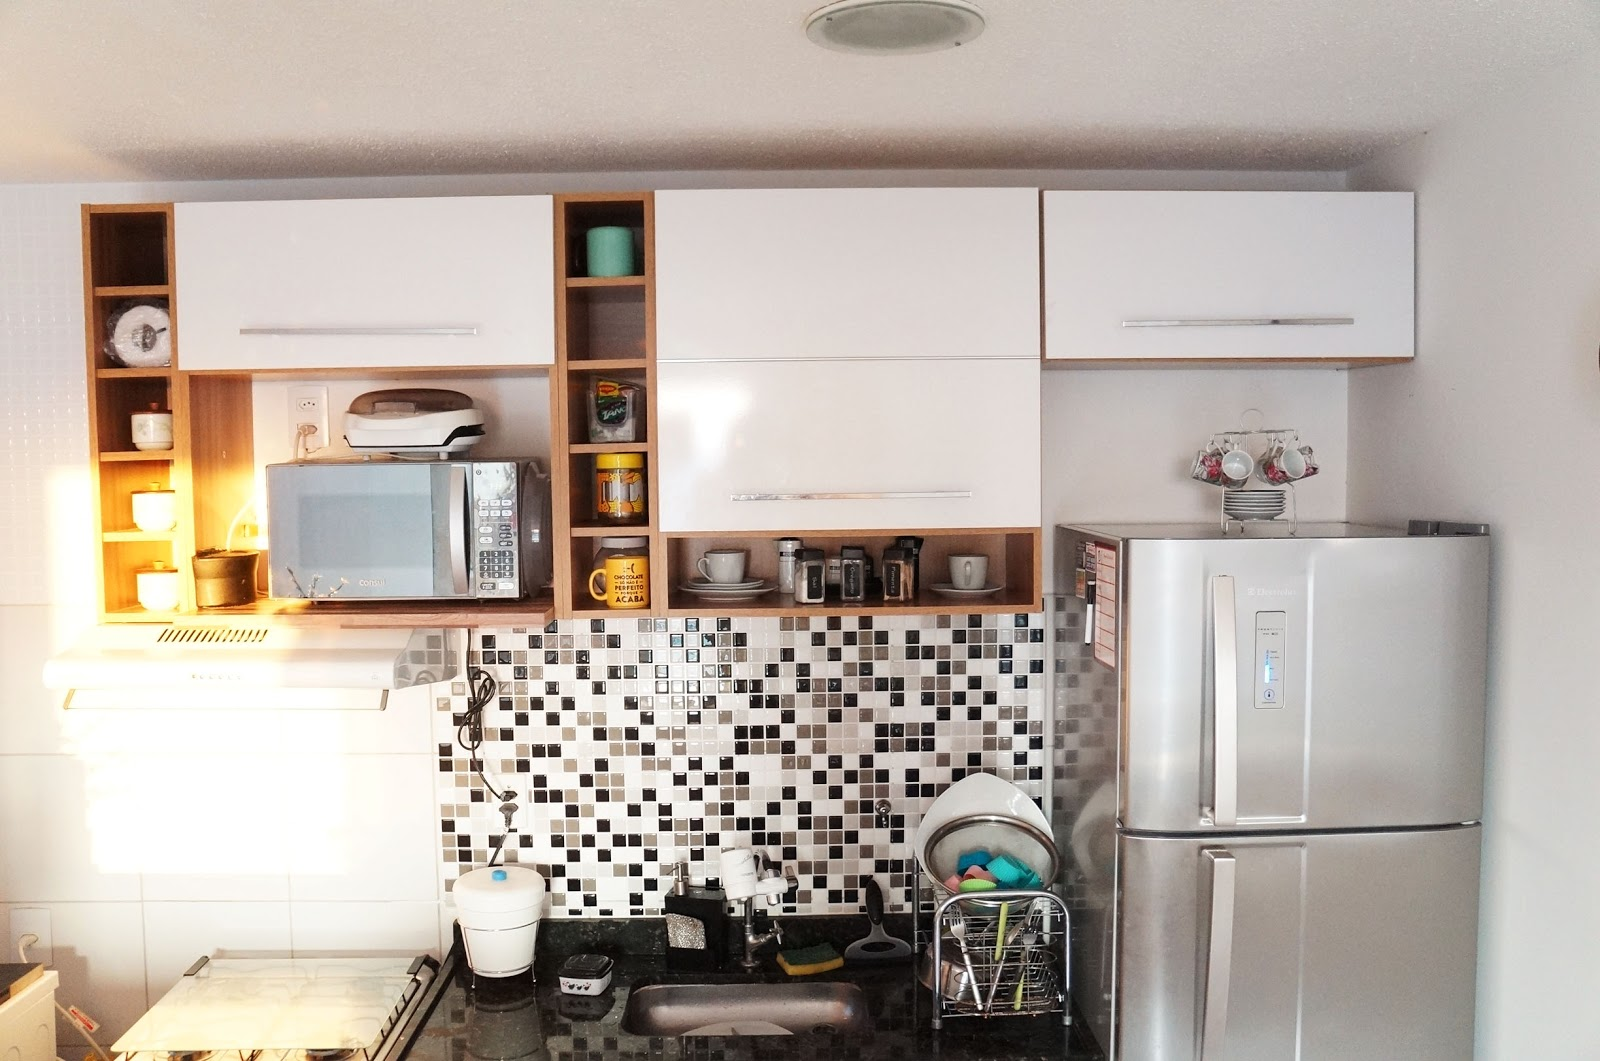 Armario De Cozinha Safira Casas Bahia : Armario de cozinha glamur beyato gt v?rios desenhos